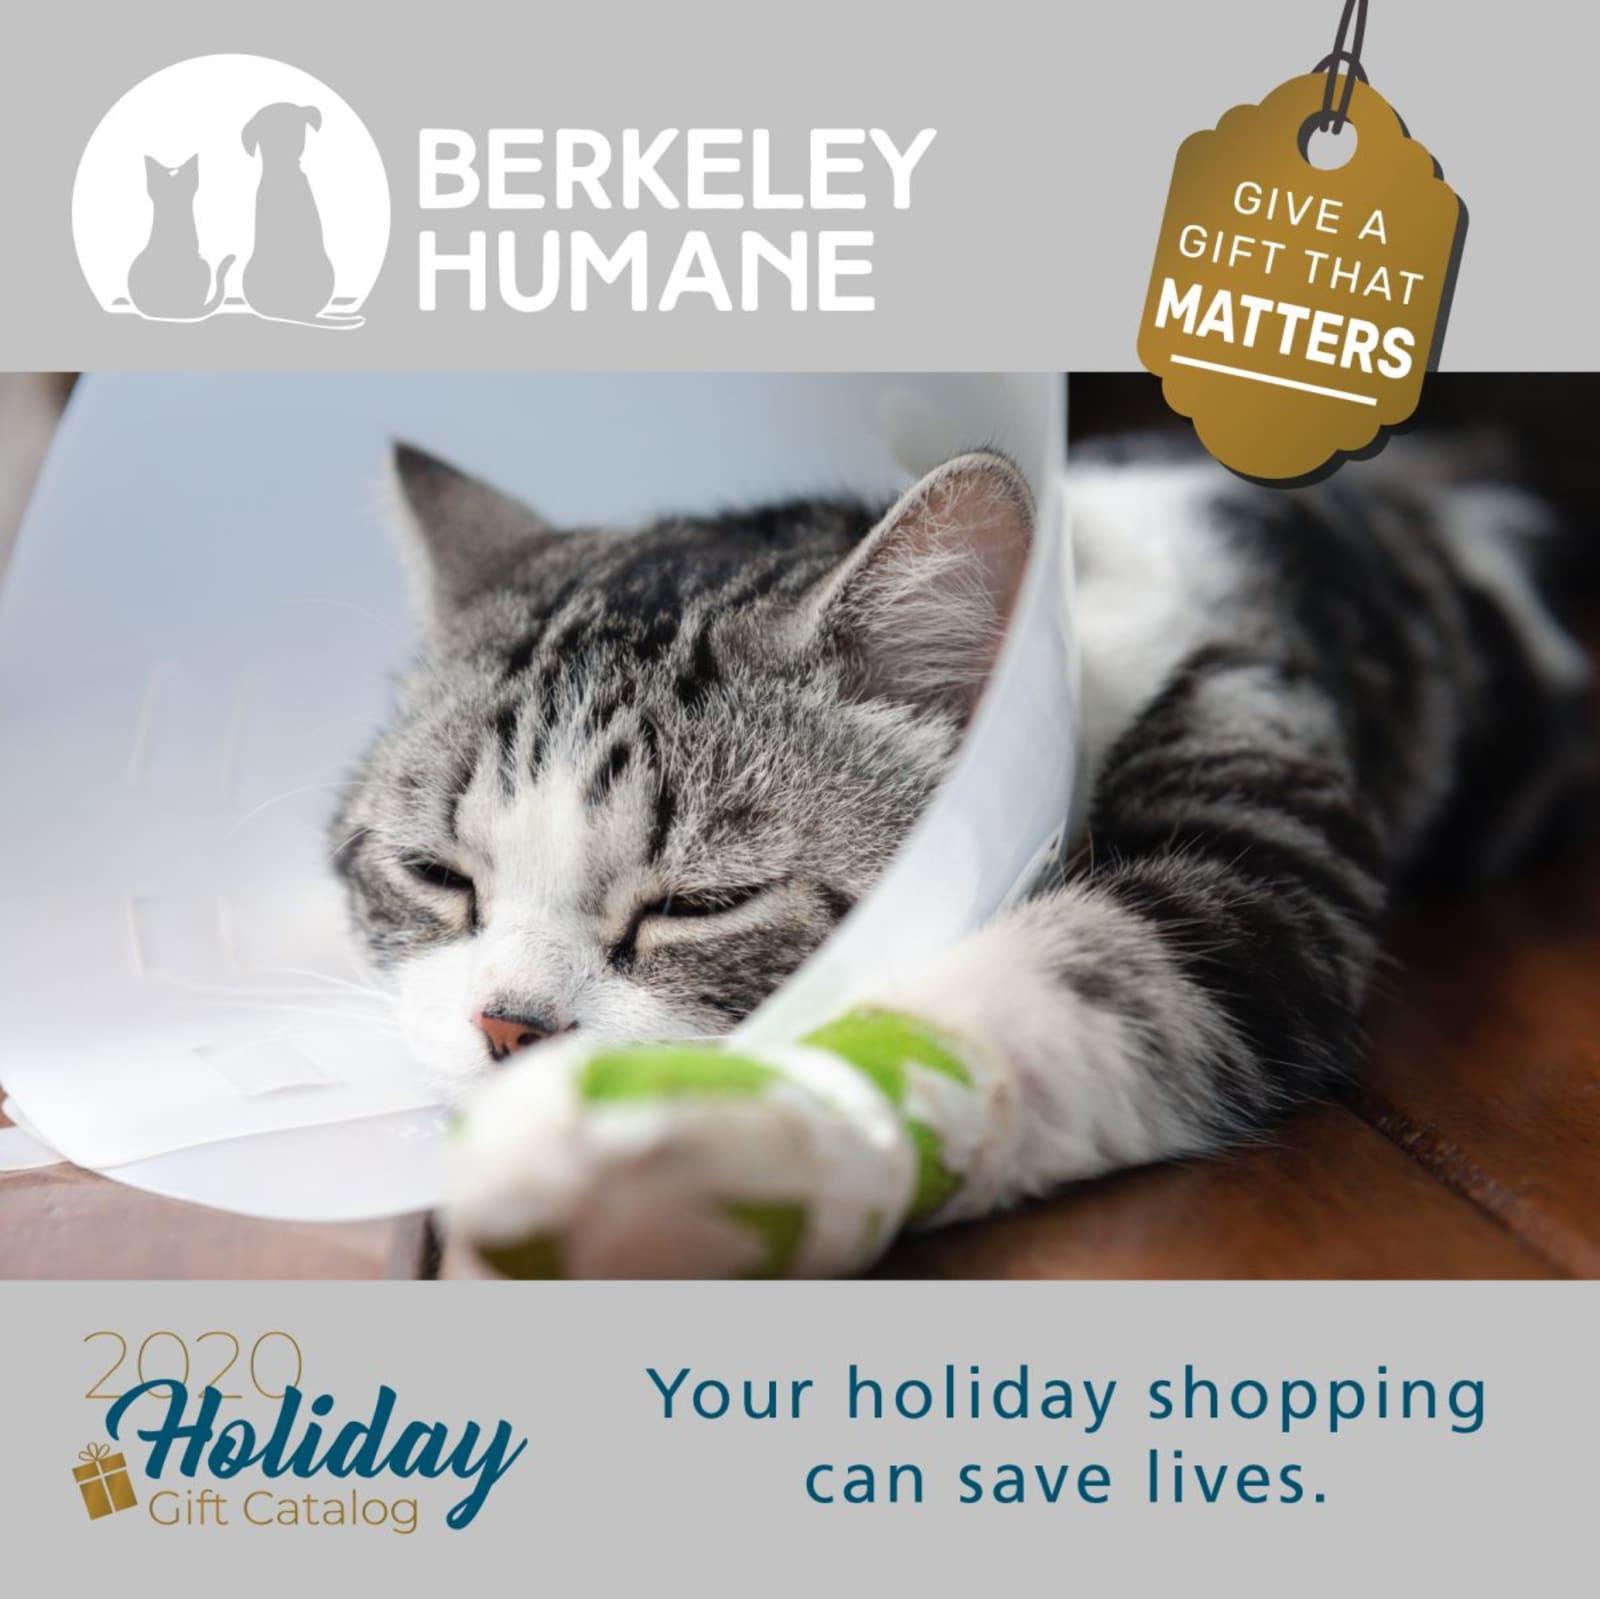 Gifts at Berkeley Humane